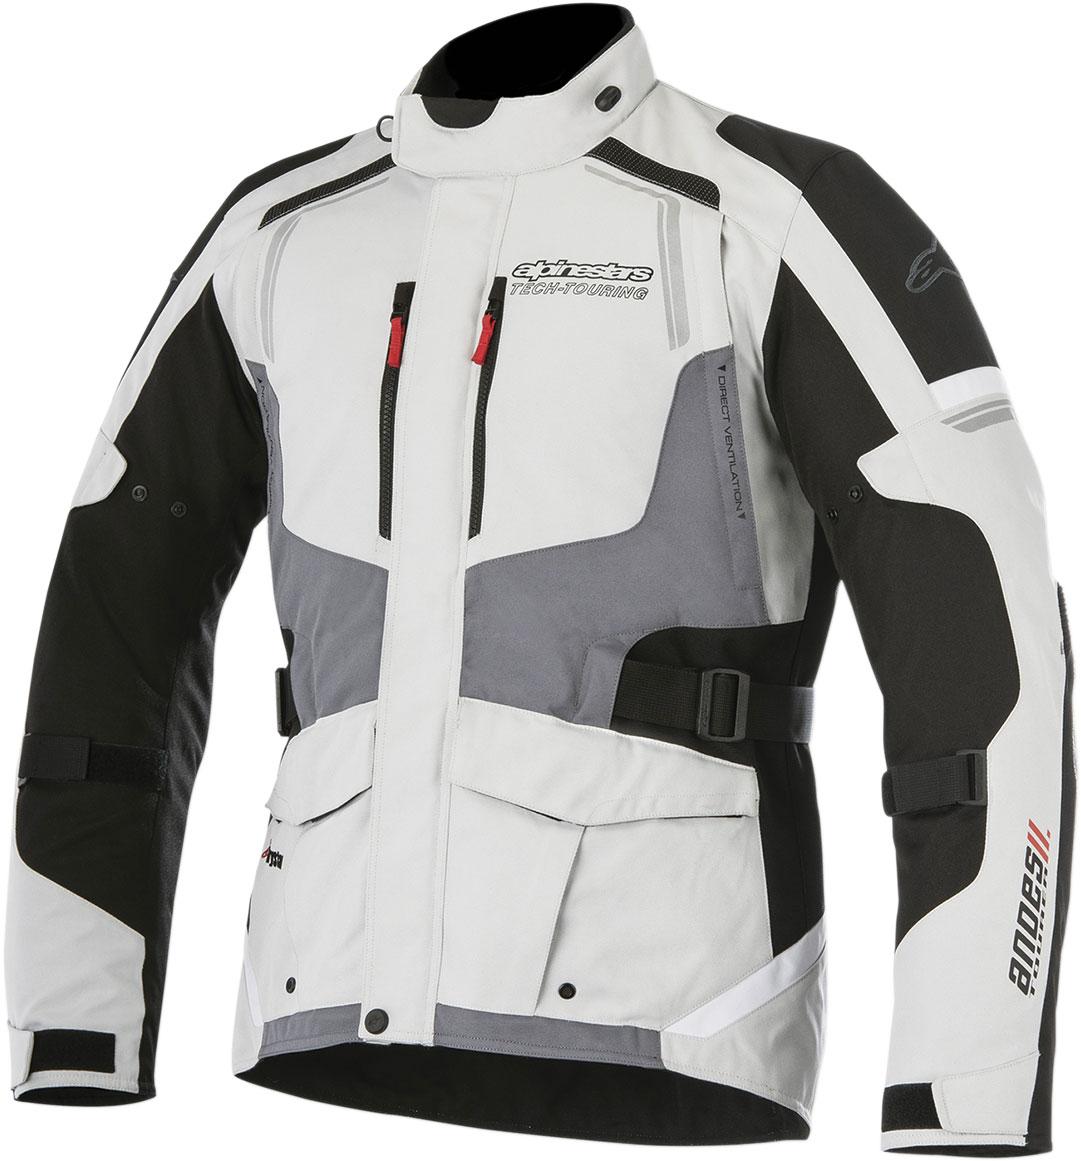 Alpinestars ANDES V2 Drystar Adventure Touring Motorcycle Jacket (Grey/Black)